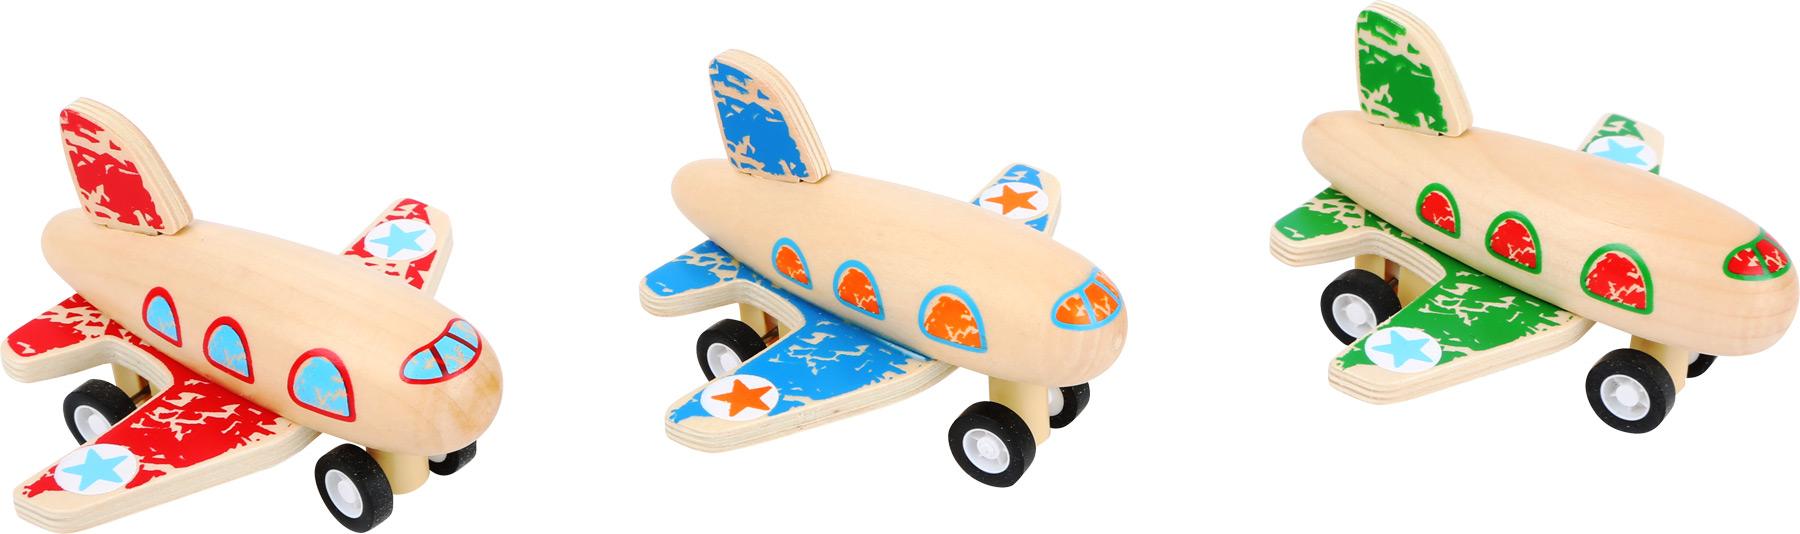 Avião Pull Back - Small Foot